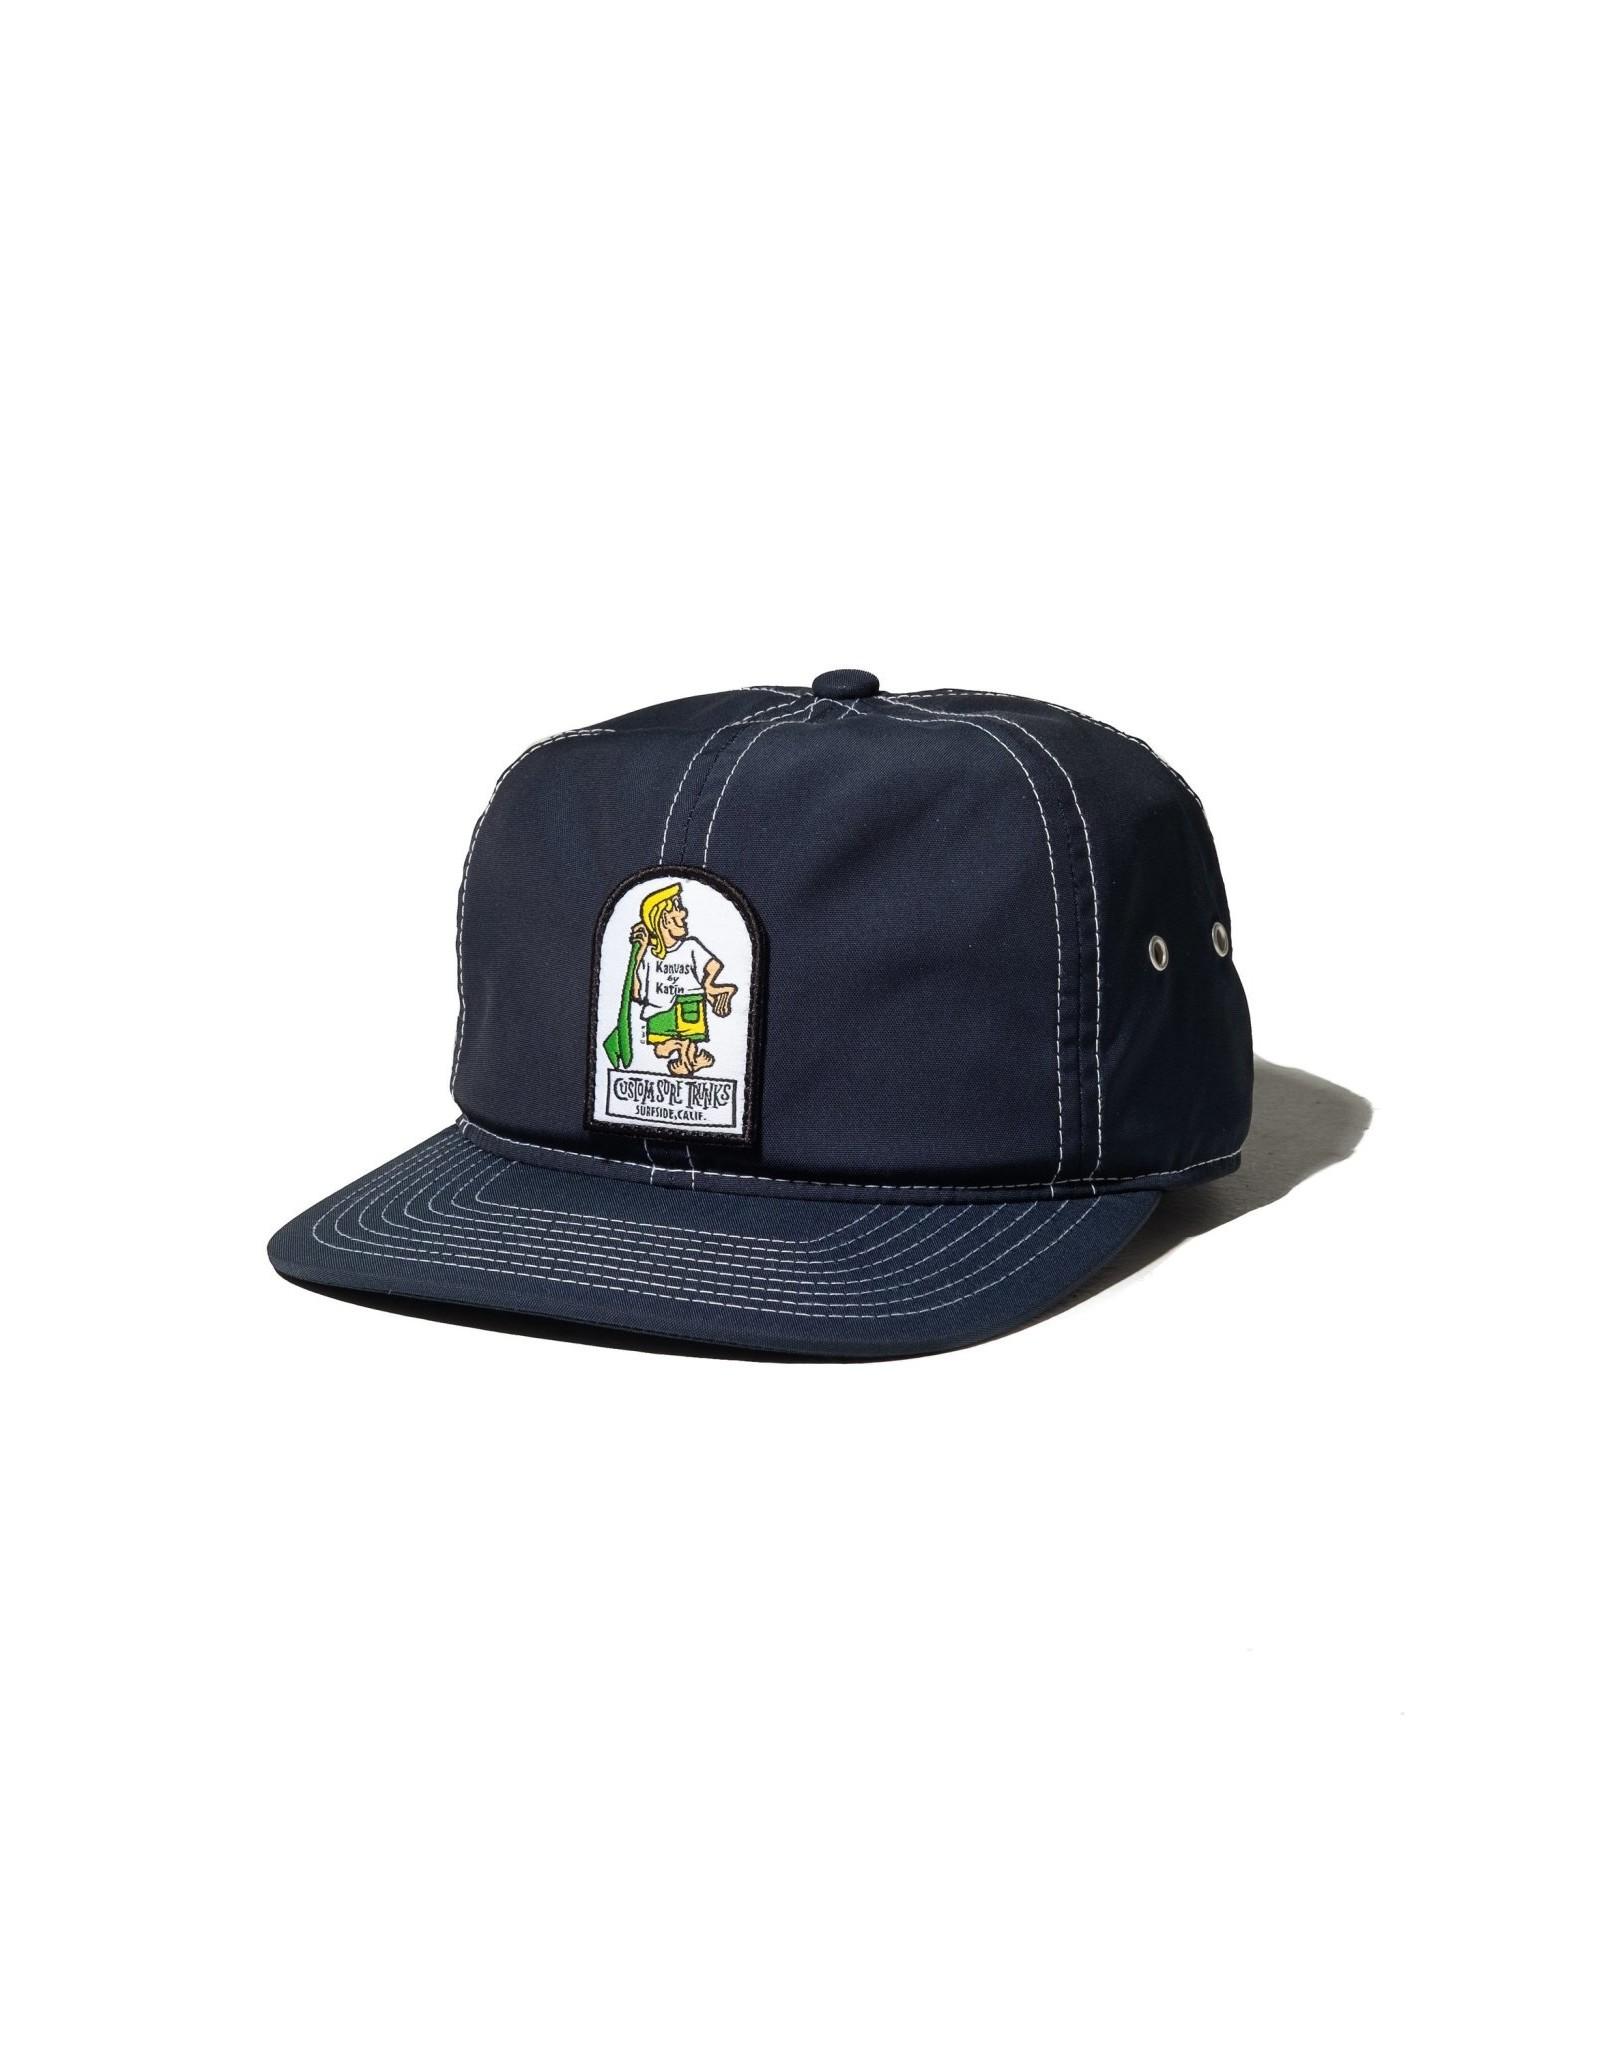 KATIN Waterman Hat - Navy